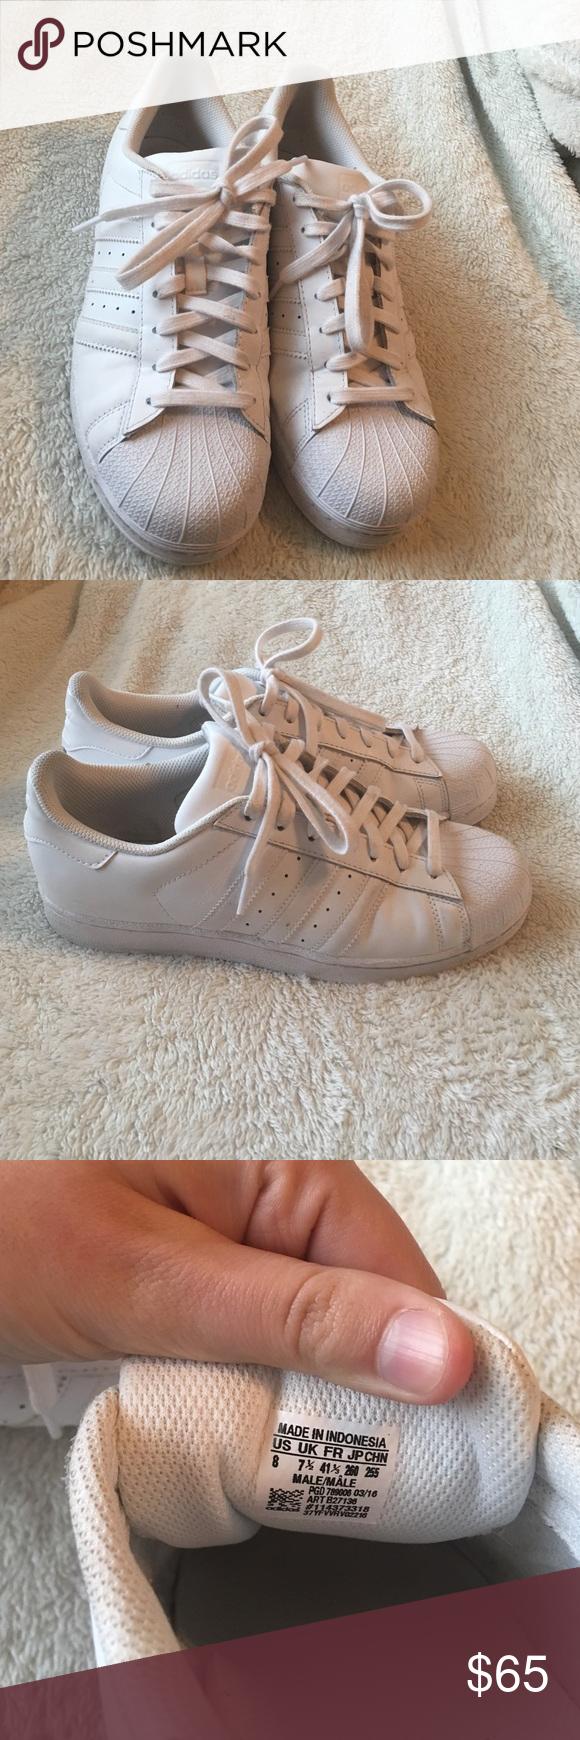 adidas superstar bianco indossato solo un paio di scarpe adidas